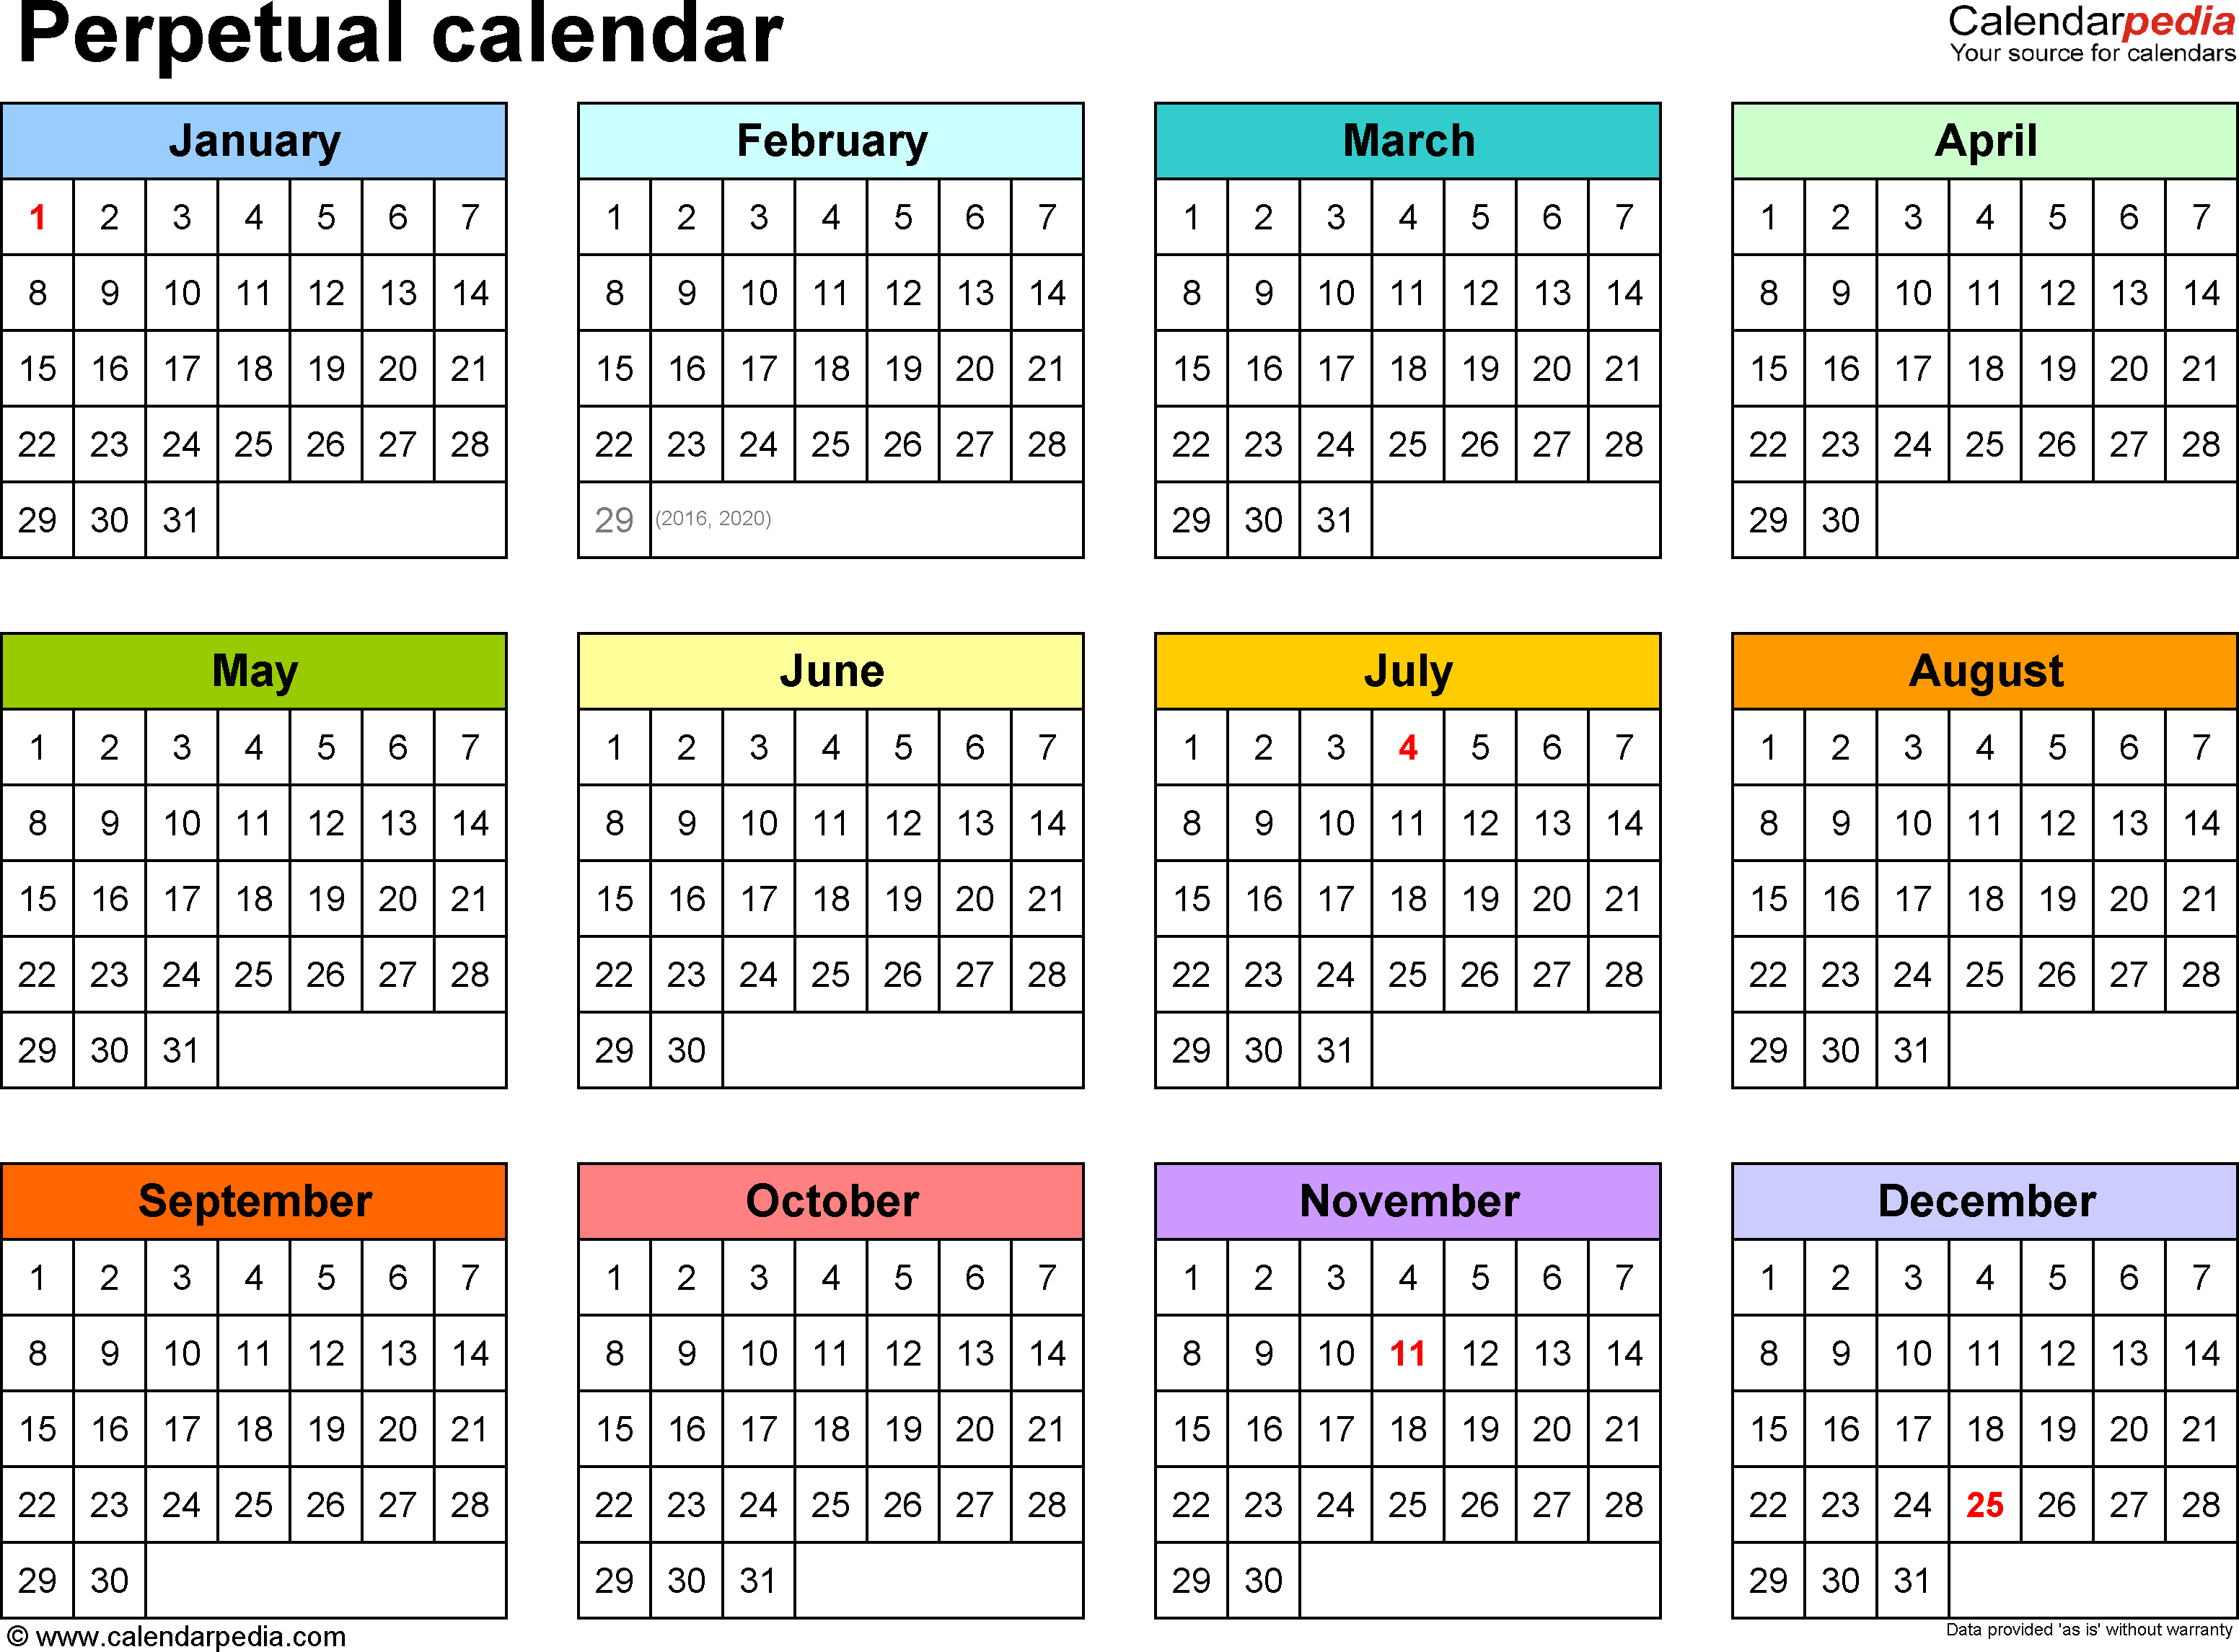 Template 5: Pdf Template For Perpetual Calendar (Landscape